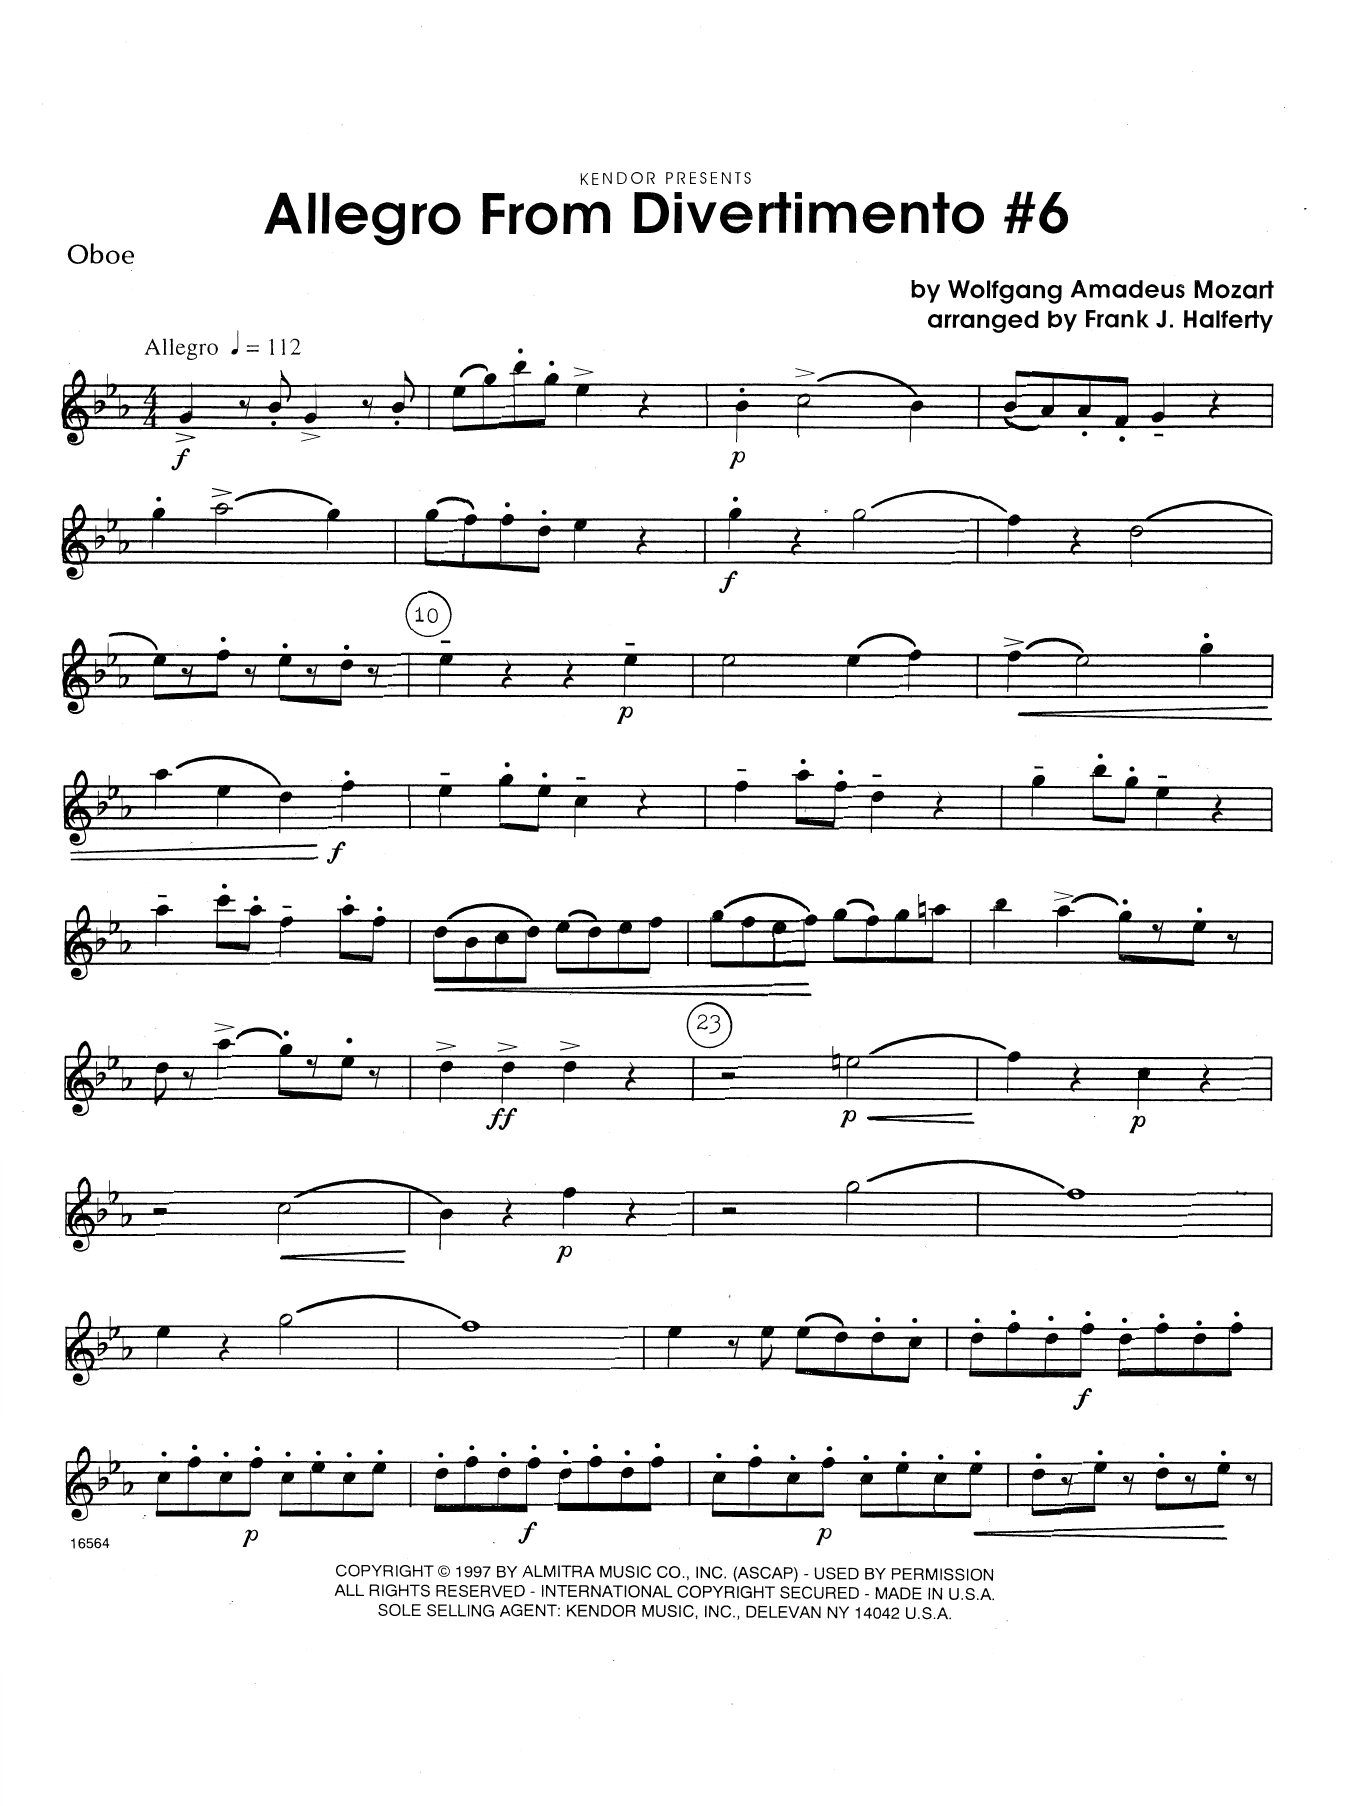 Allegro From Divertimento #6 (arr. Frank Halferty) - Oboe Sheet Music